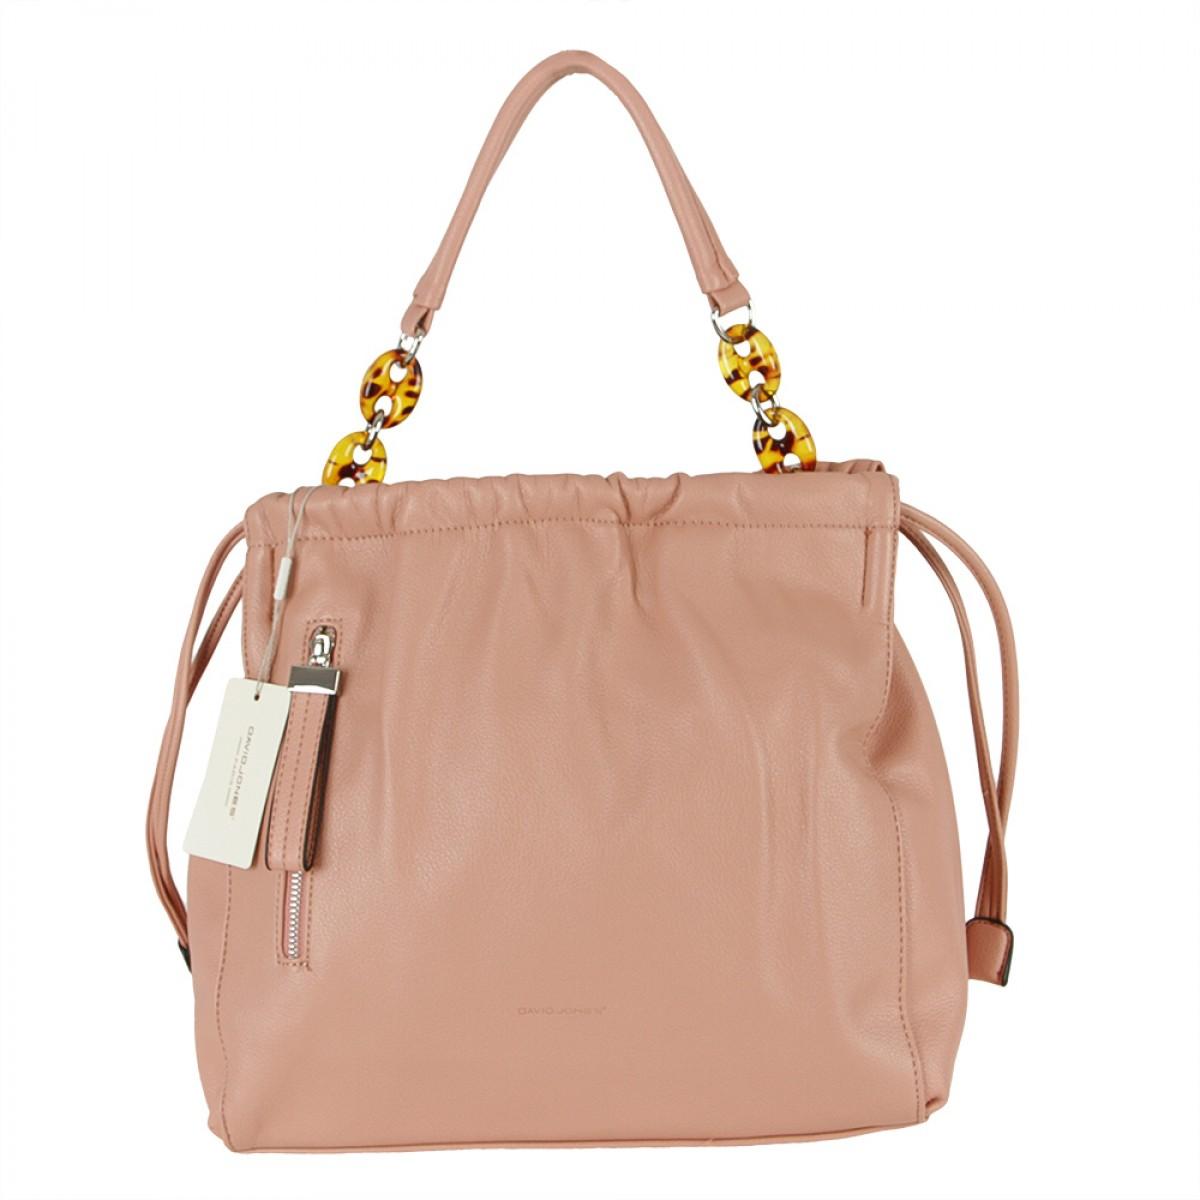 Жіноча сумка David Jones 6319-3 PINK